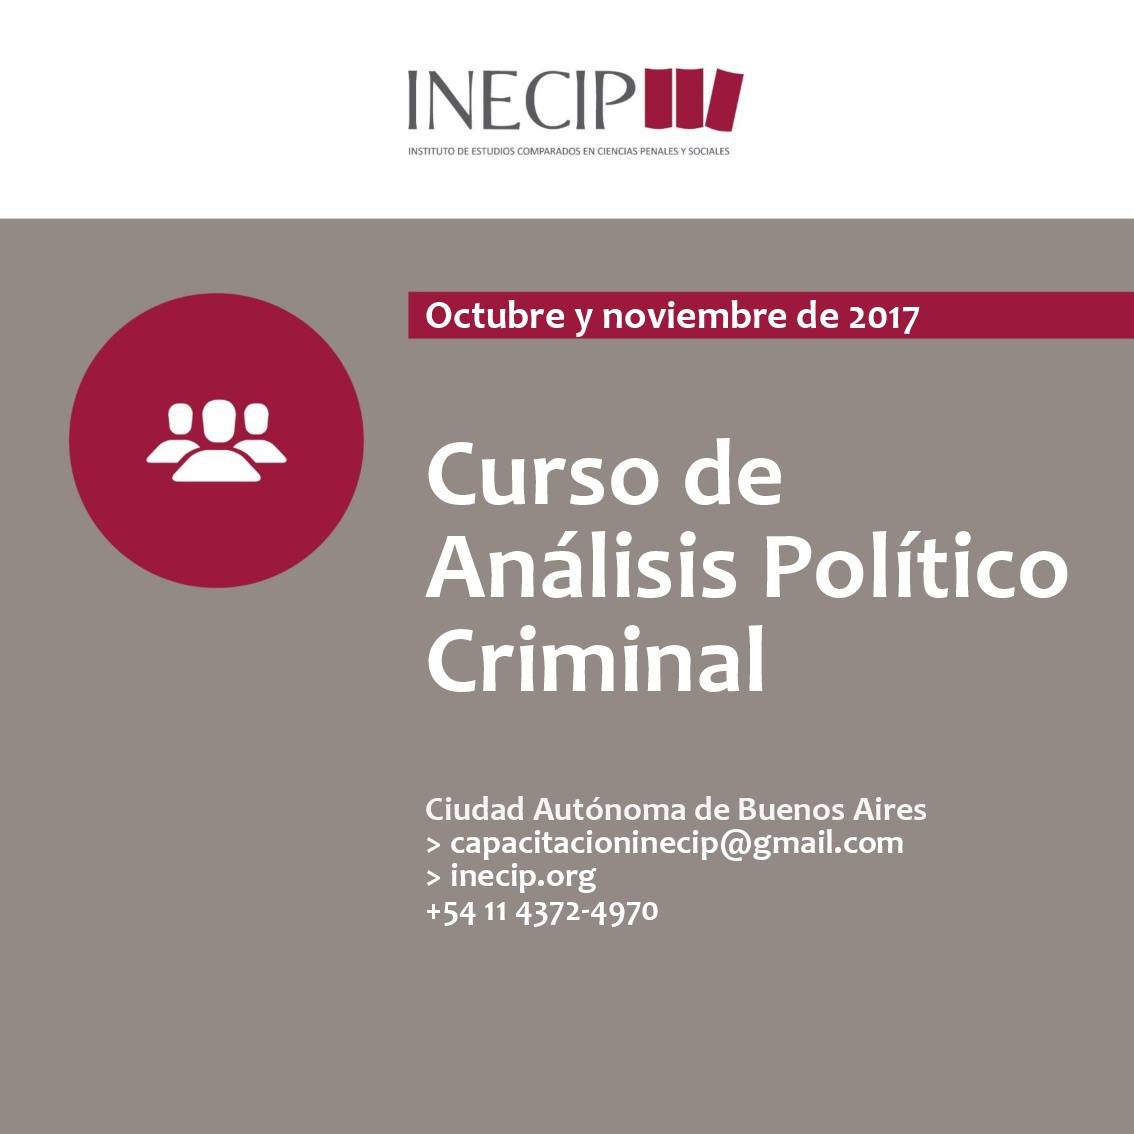 Curso de Análisis Político Criminal